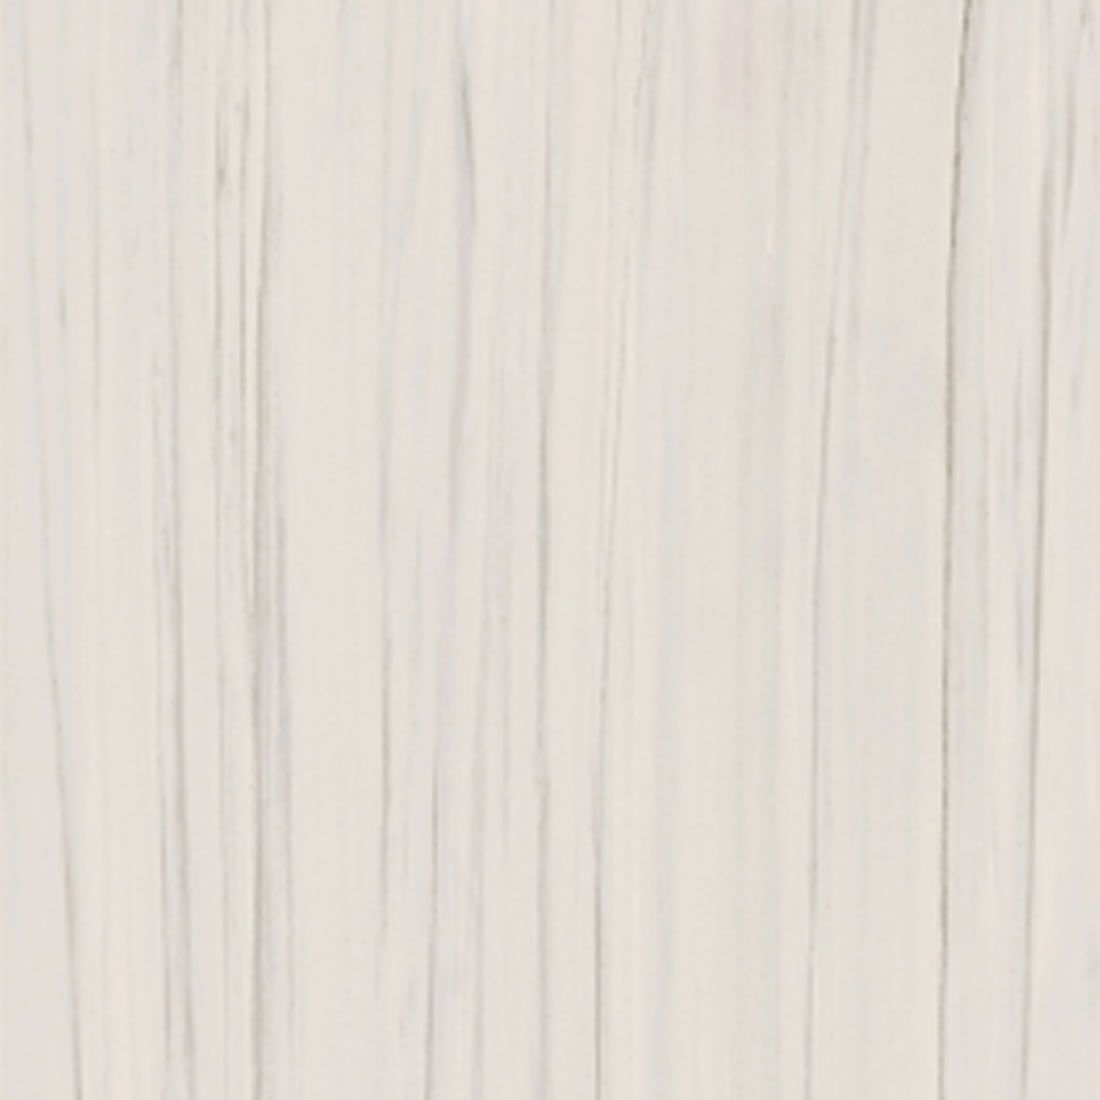 Porcelanato Elizabeth Bianco Cezanne HD Polido 62,5x62,5 Com 1,58mts na Caixa